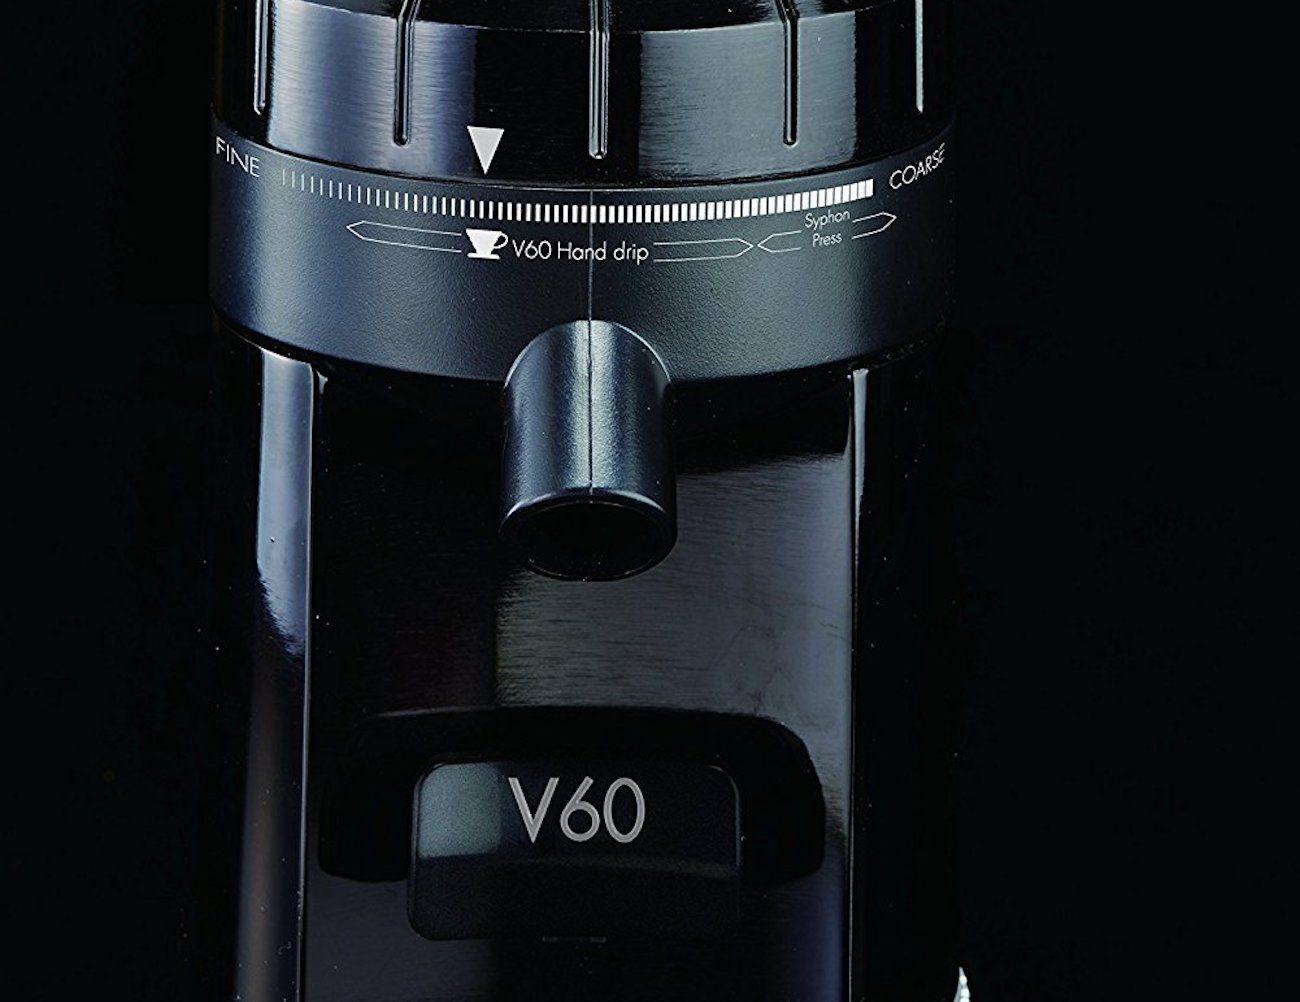 Hario V60 Electric Coffee Bean Grinder